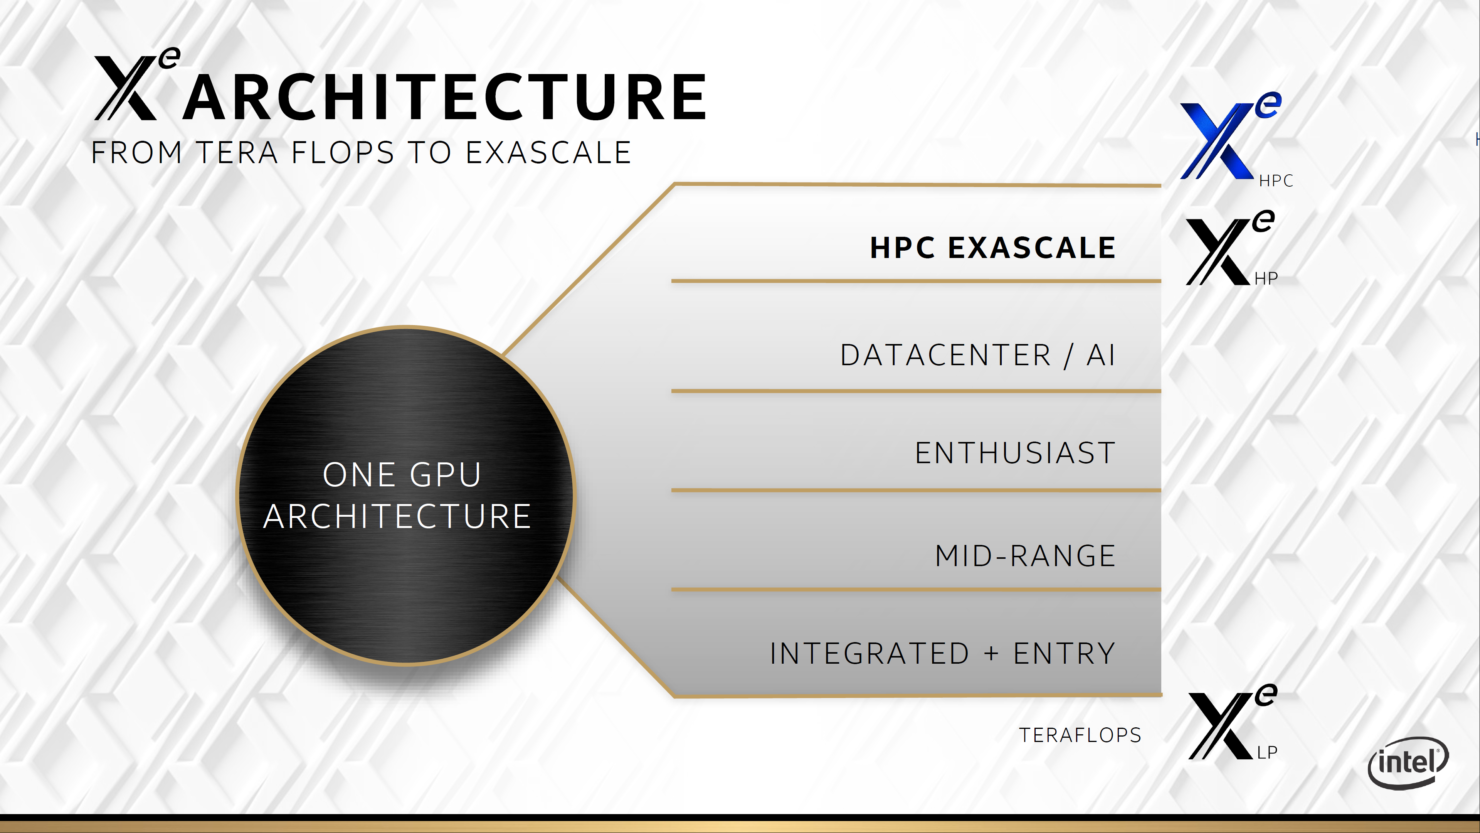 intel-xe-hpc-gpu_ponte-vecchio_architecture_raja-koduri_4